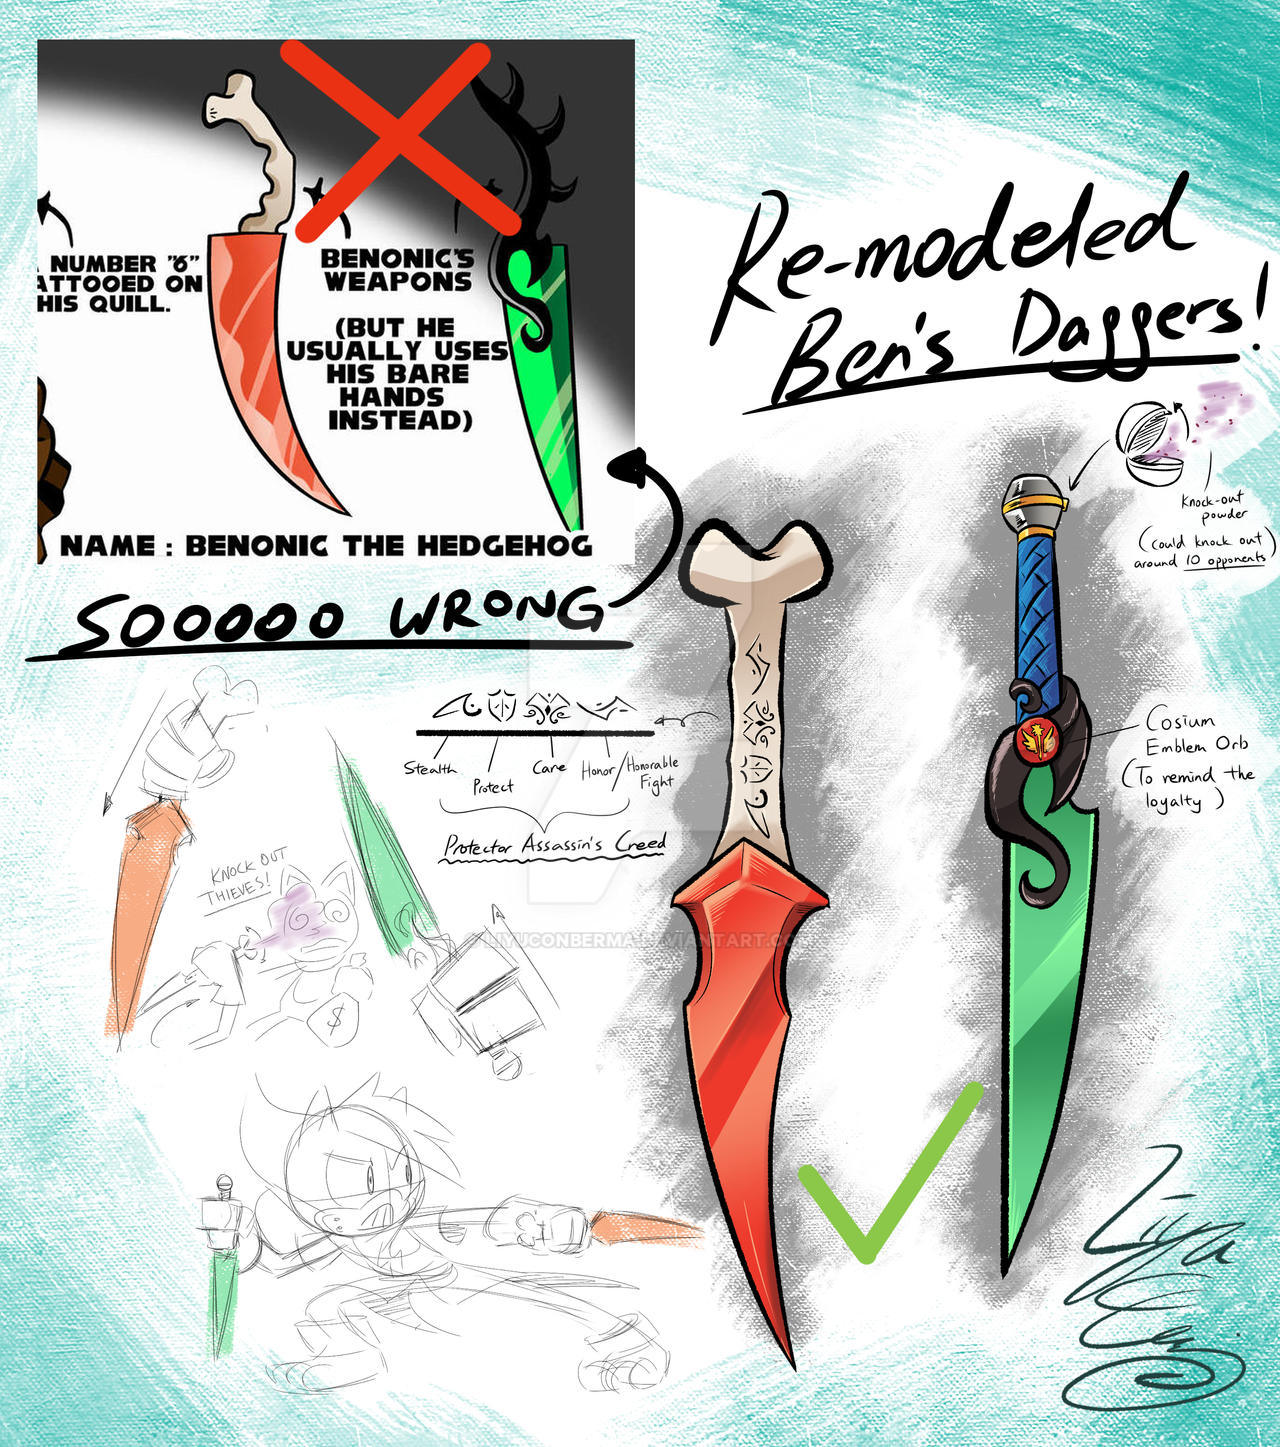 Benonic's REMODELED Daggers